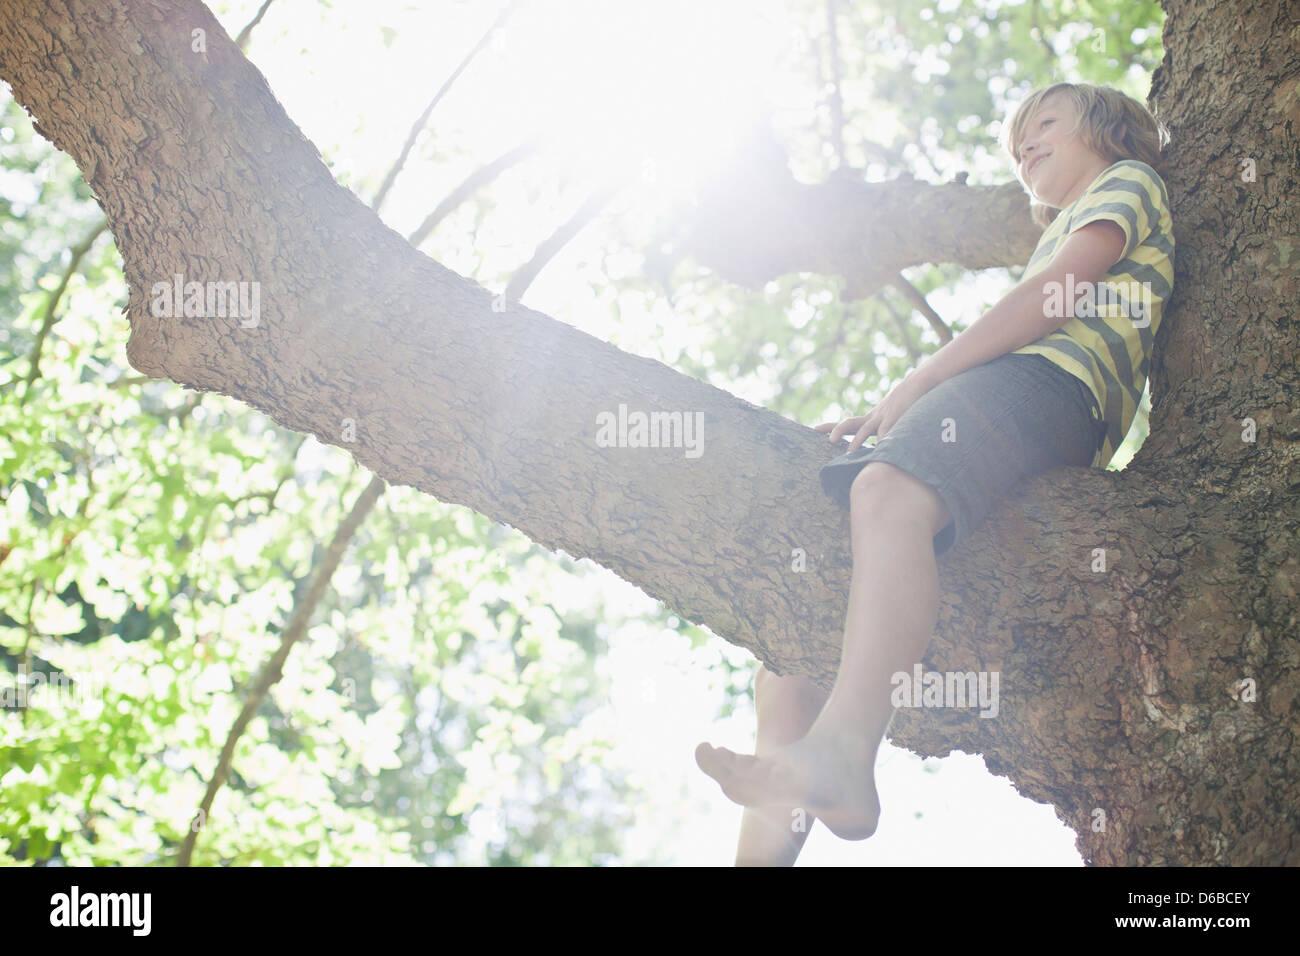 Smiling boy sitting in tree - Stock Image